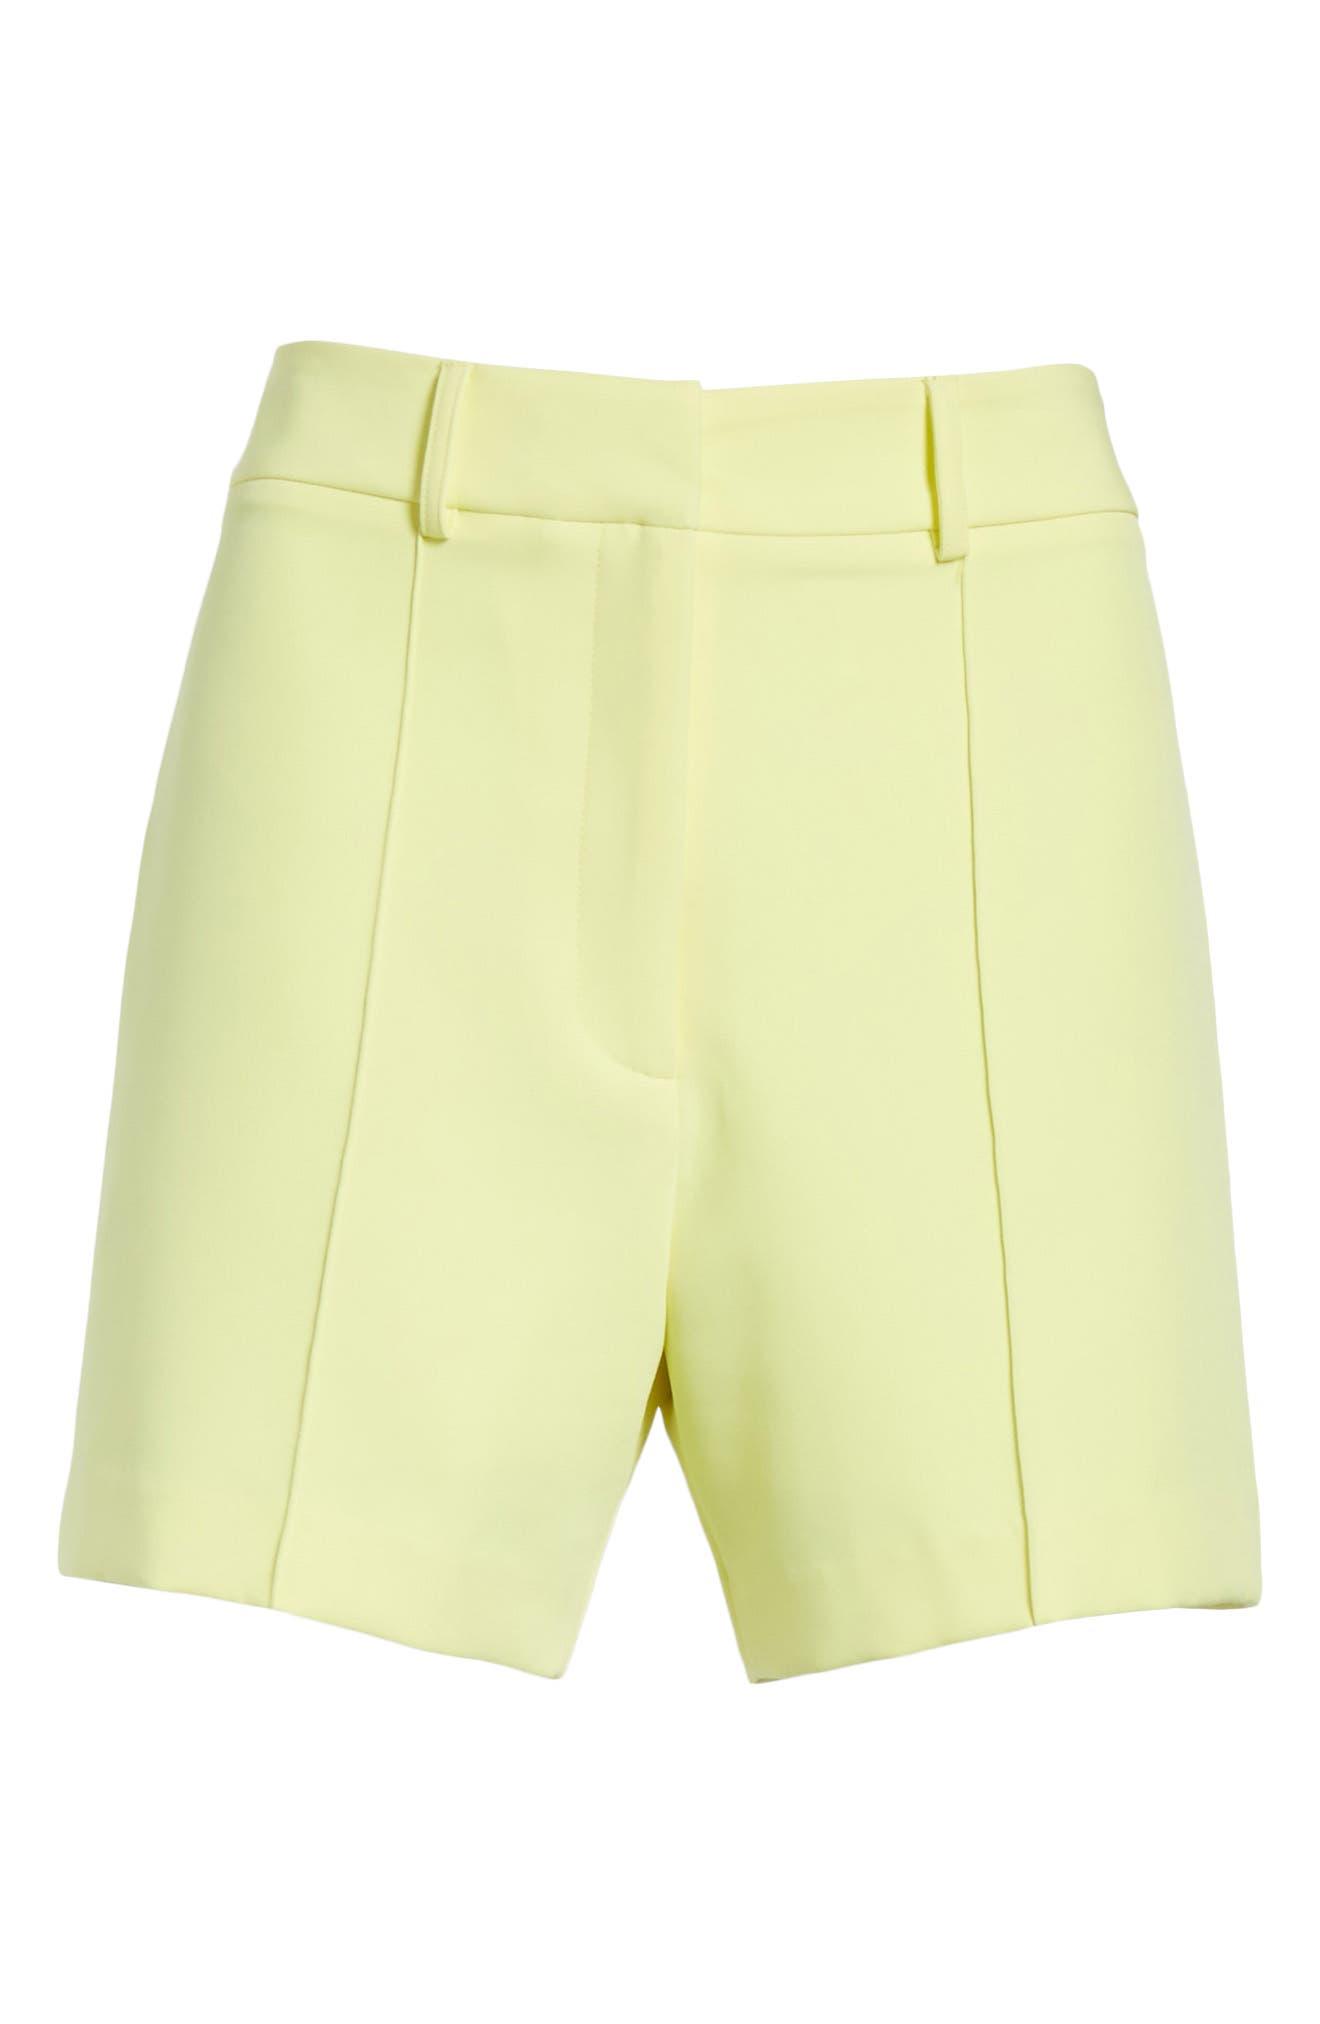 Hayden Trouser Shorts,                             Alternate thumbnail 12, color,